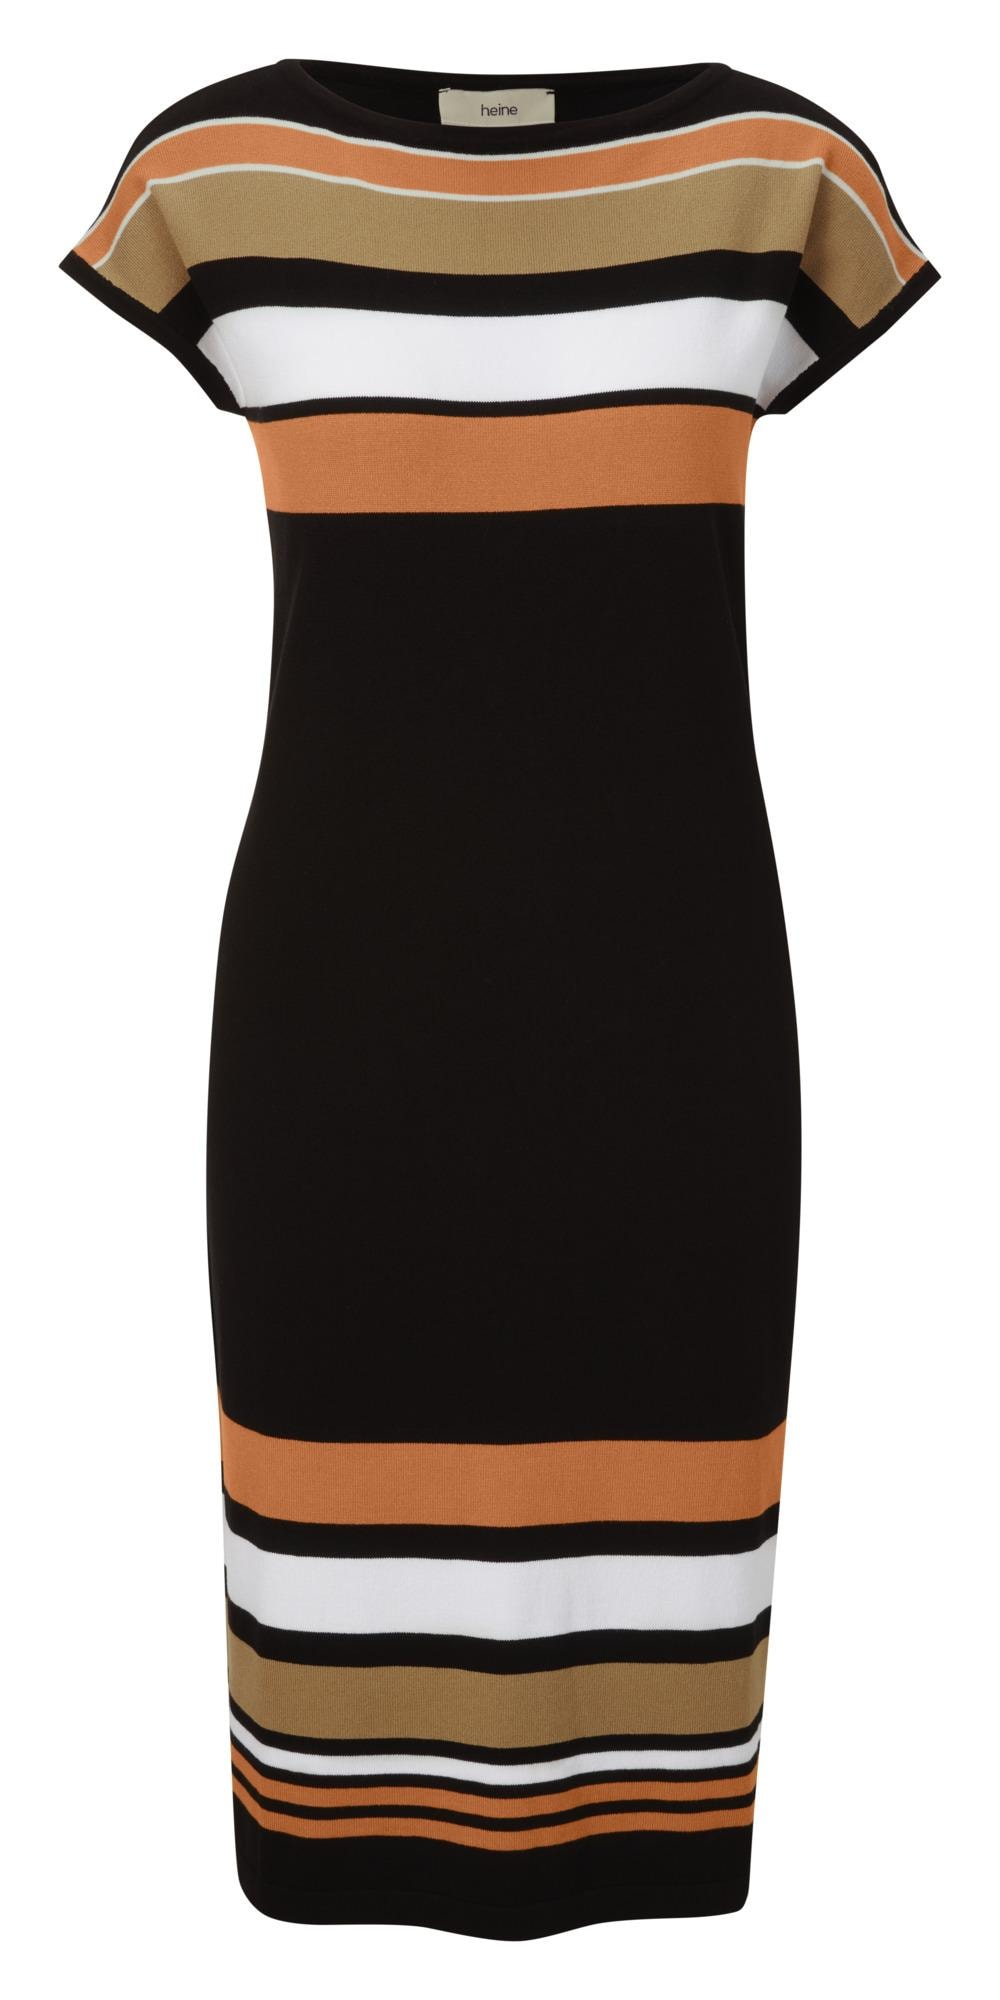 heine Megzta suknelė juoda / balta / ruda / oranžinė